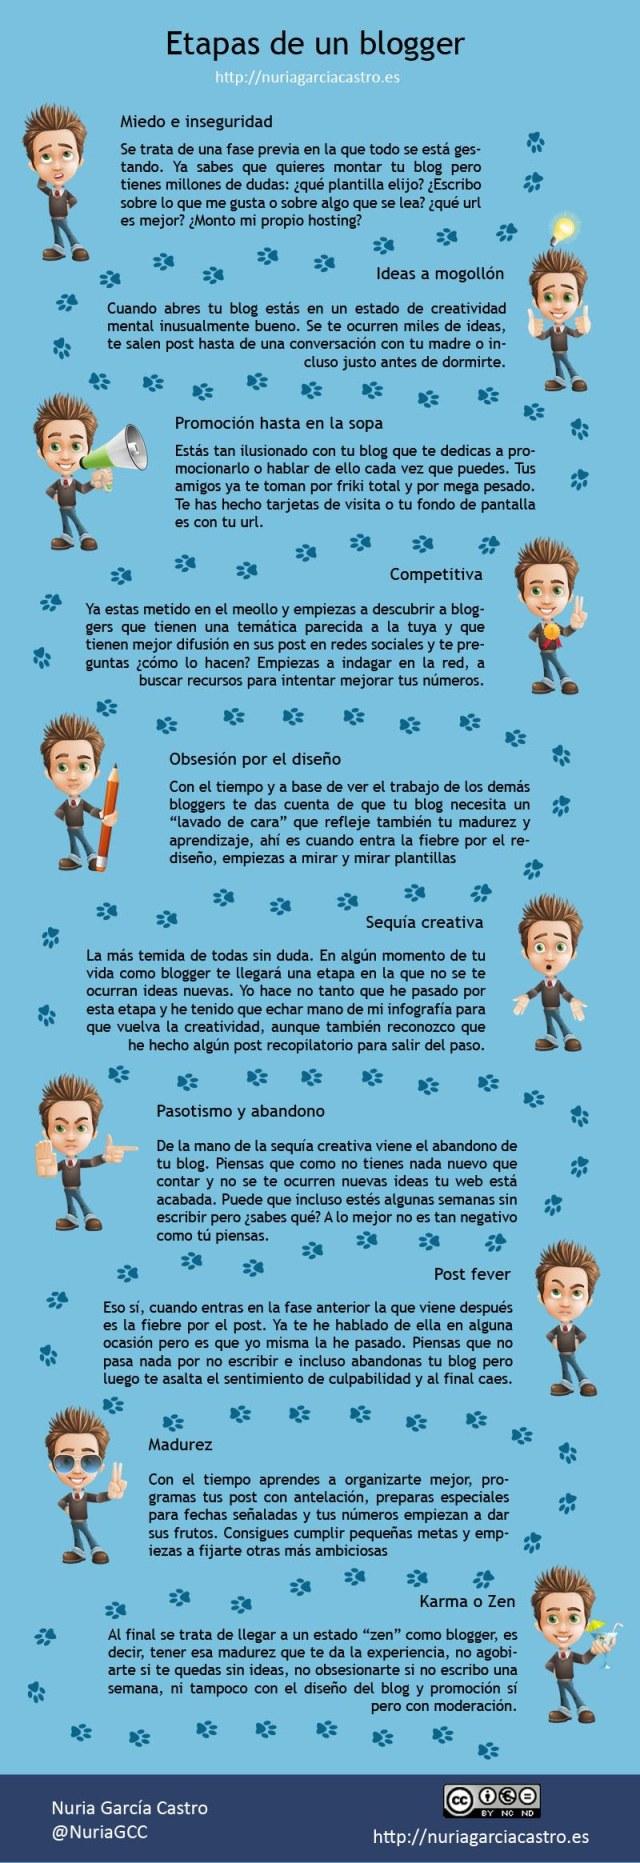 Las etapas por las que pasa un blogger